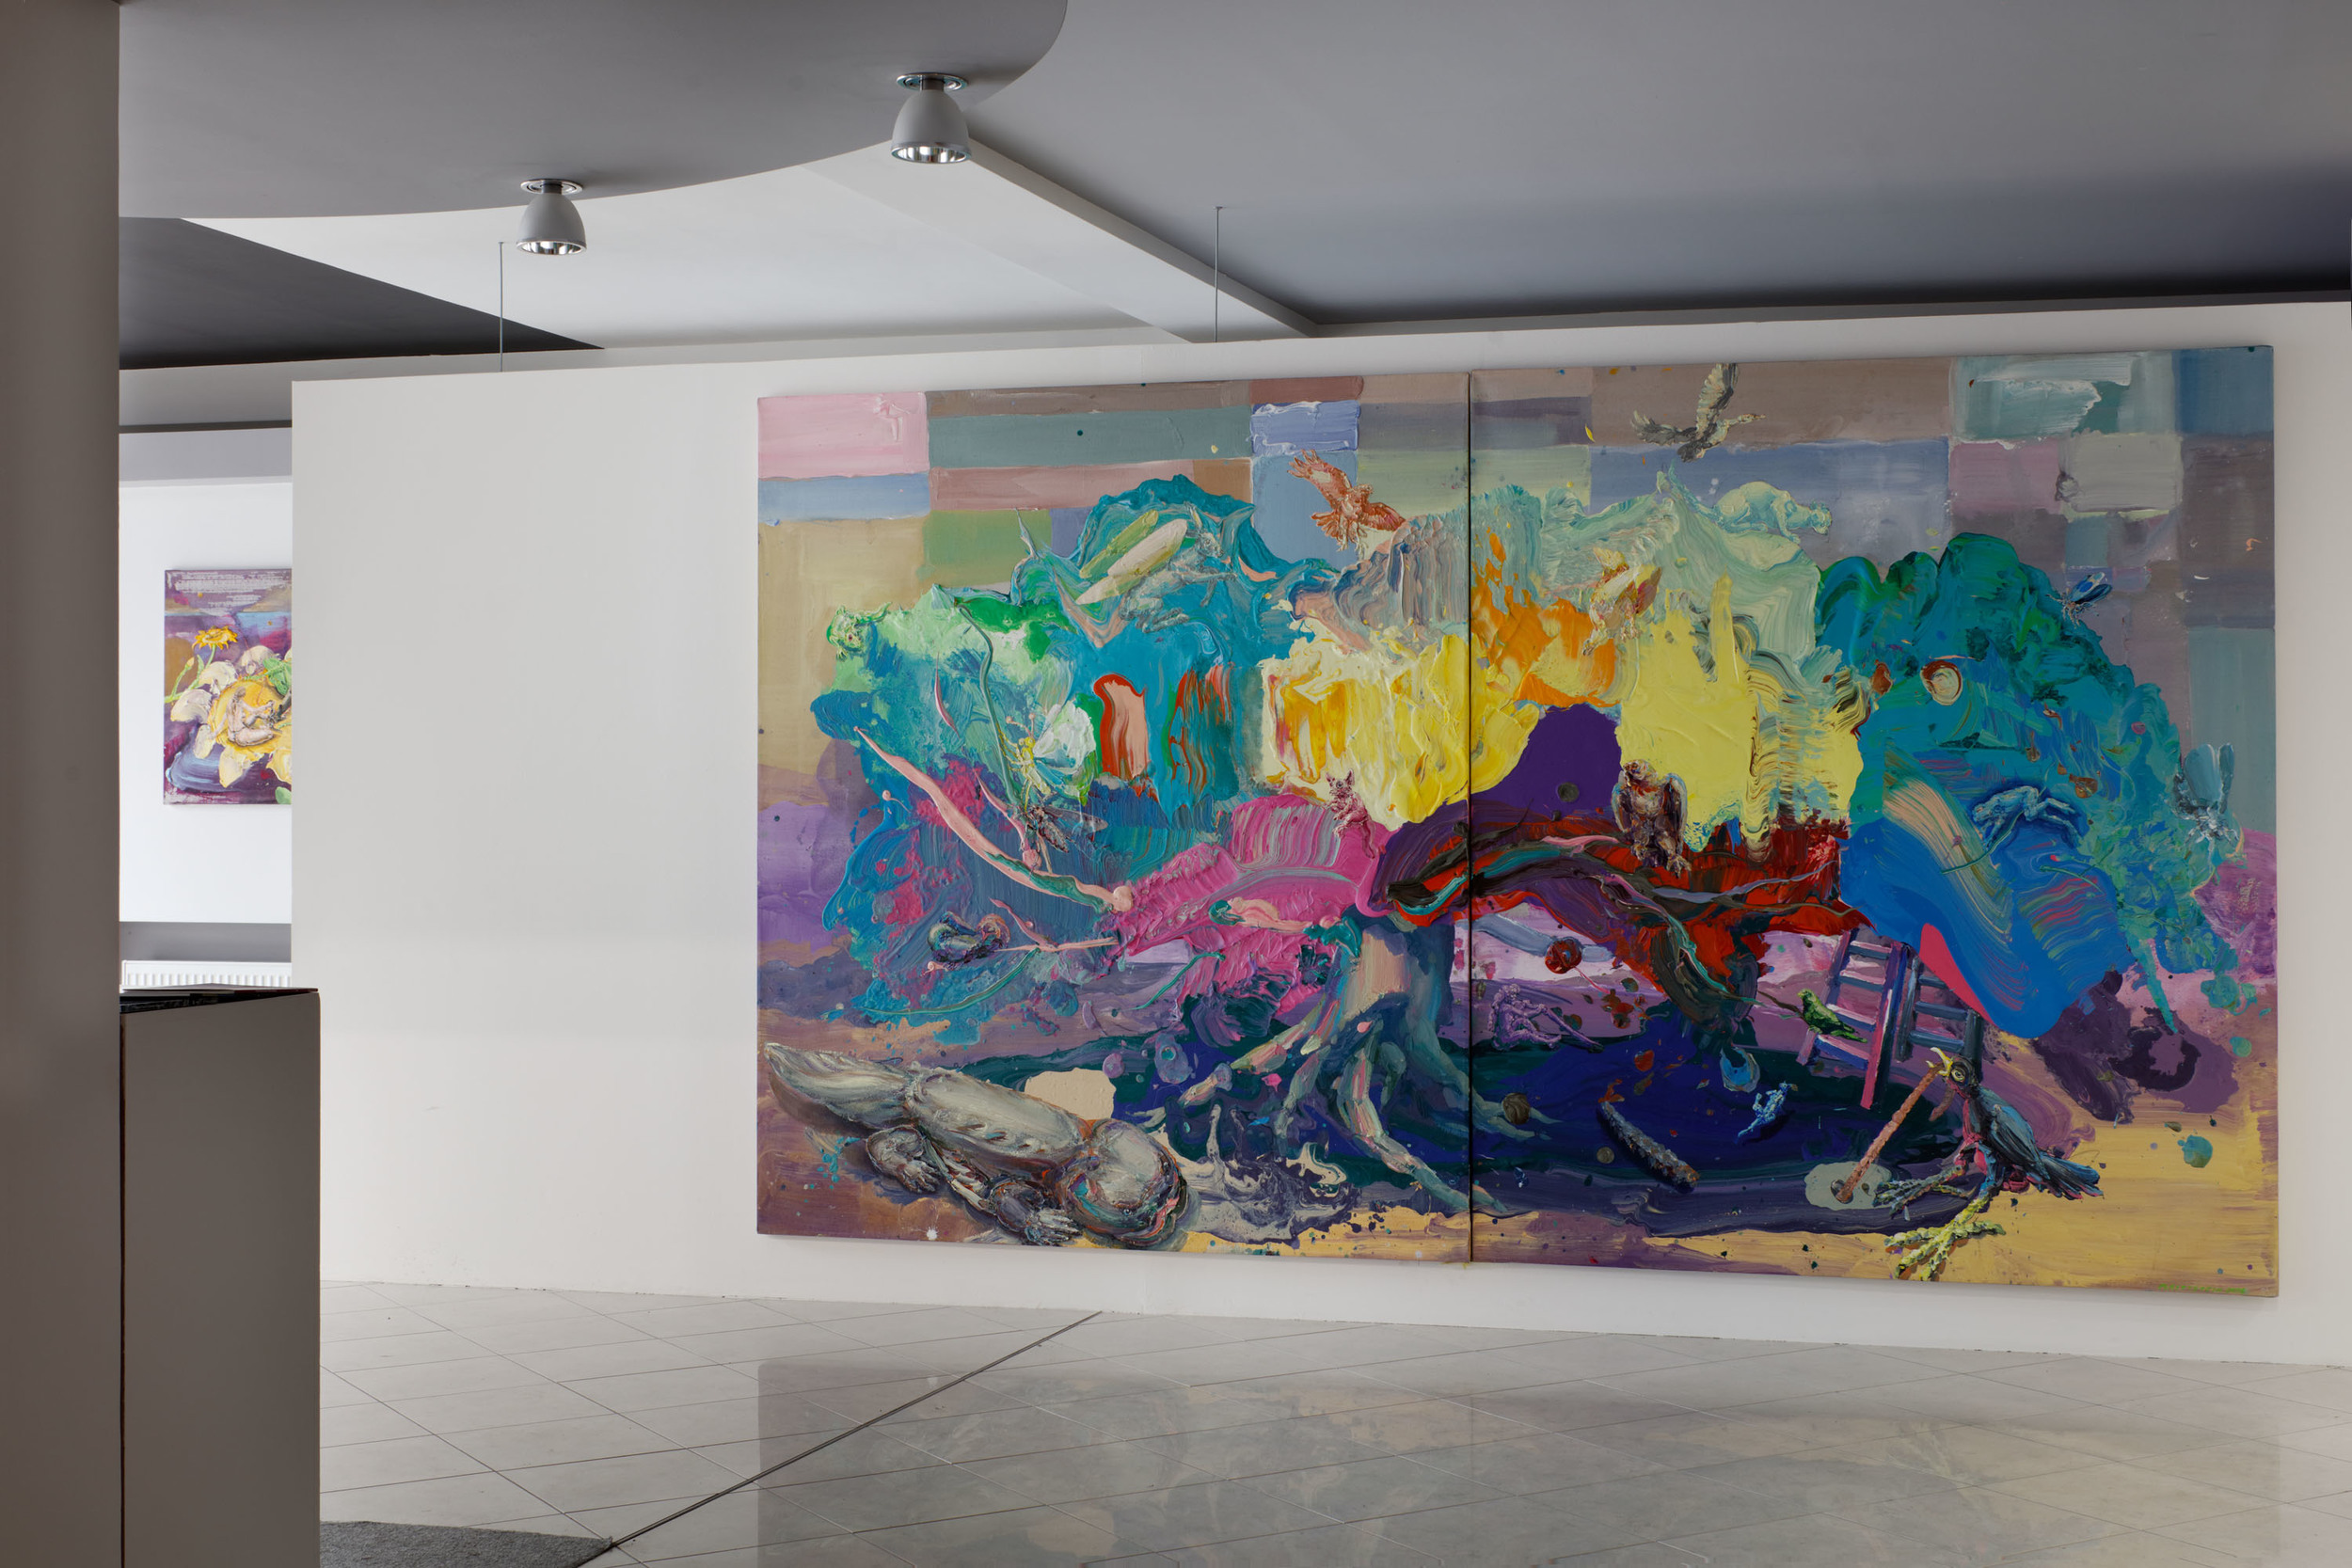 Michael Rittstein, Třešeň I, 2015, plátno, akryl, 190 x 220 cm    Michael Rittstein, Třešeň II, 2015, plátno, akryl, 190 x 220 cm